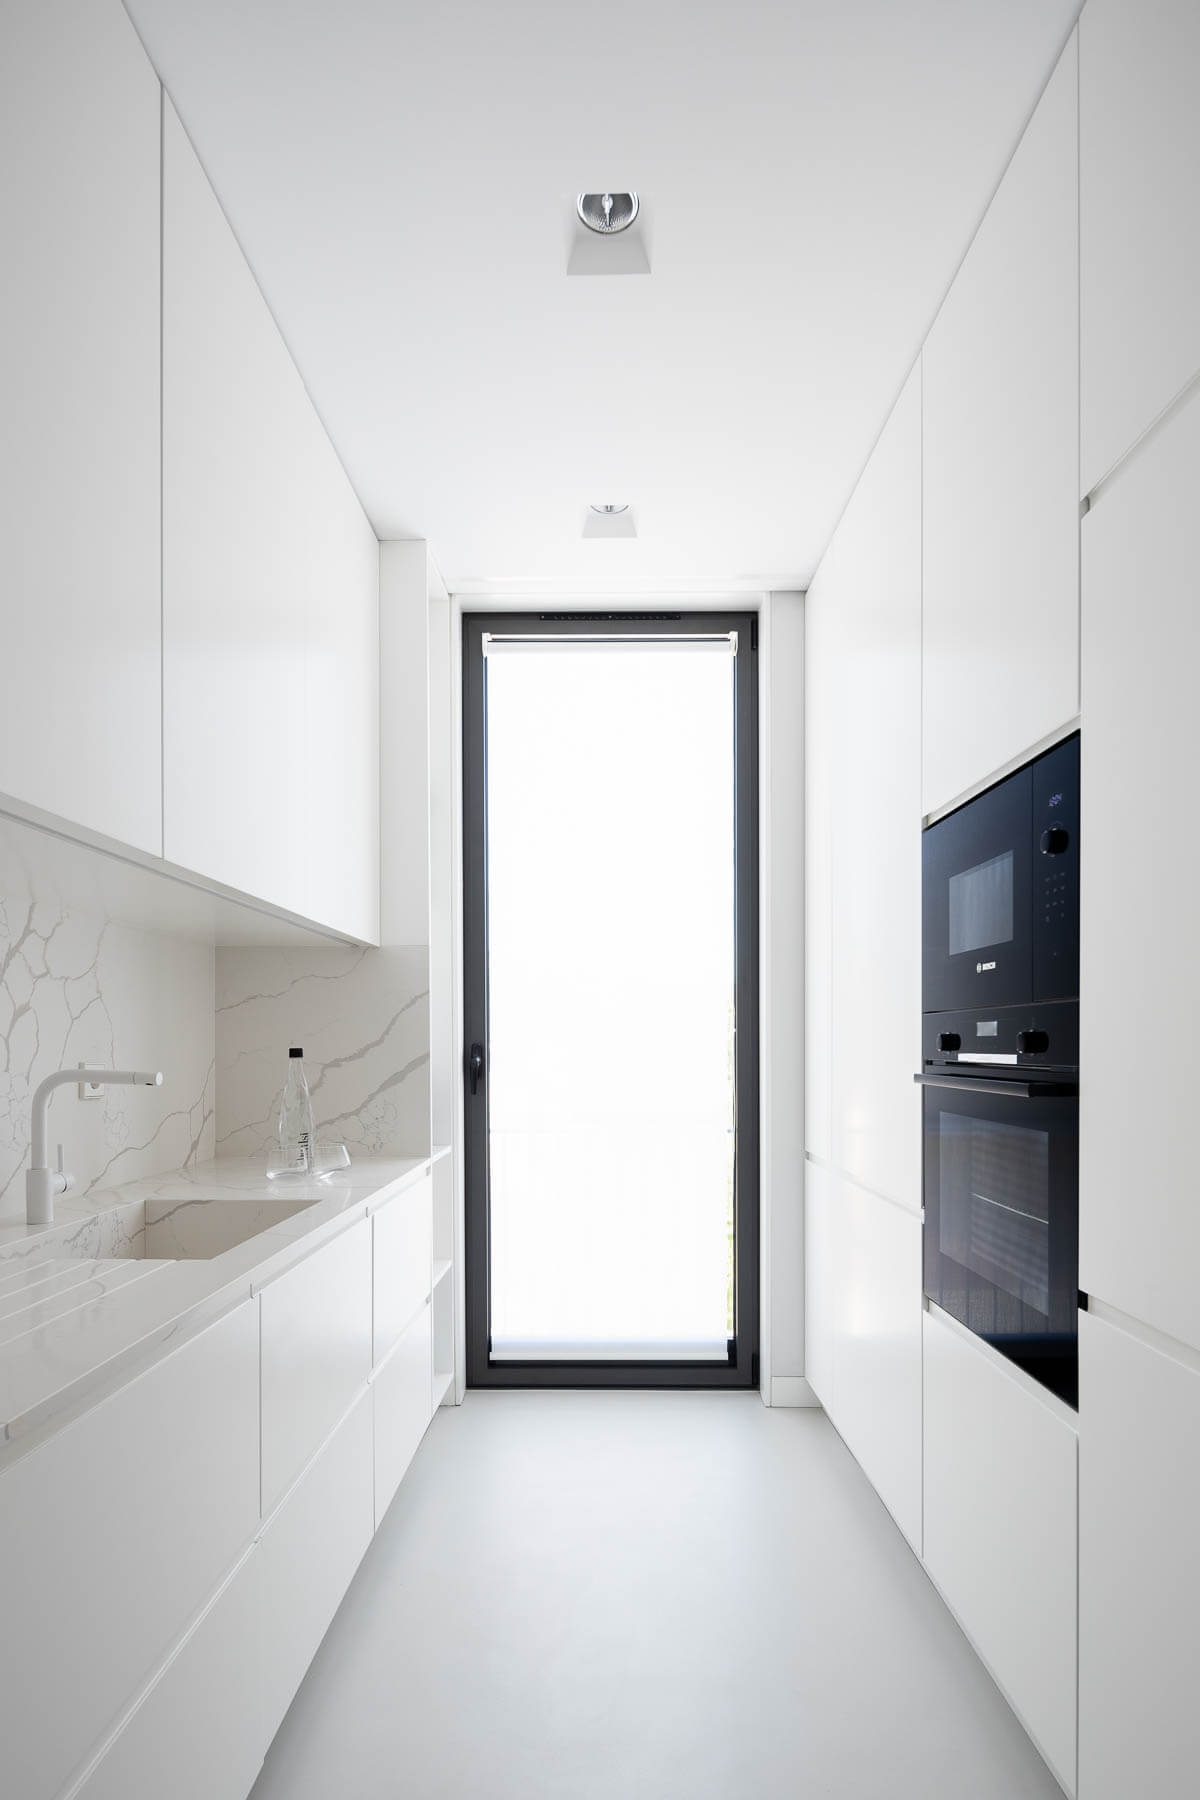 20210504 JUST AN ARCHITECT TORRE 261 AMARANTE 056 1